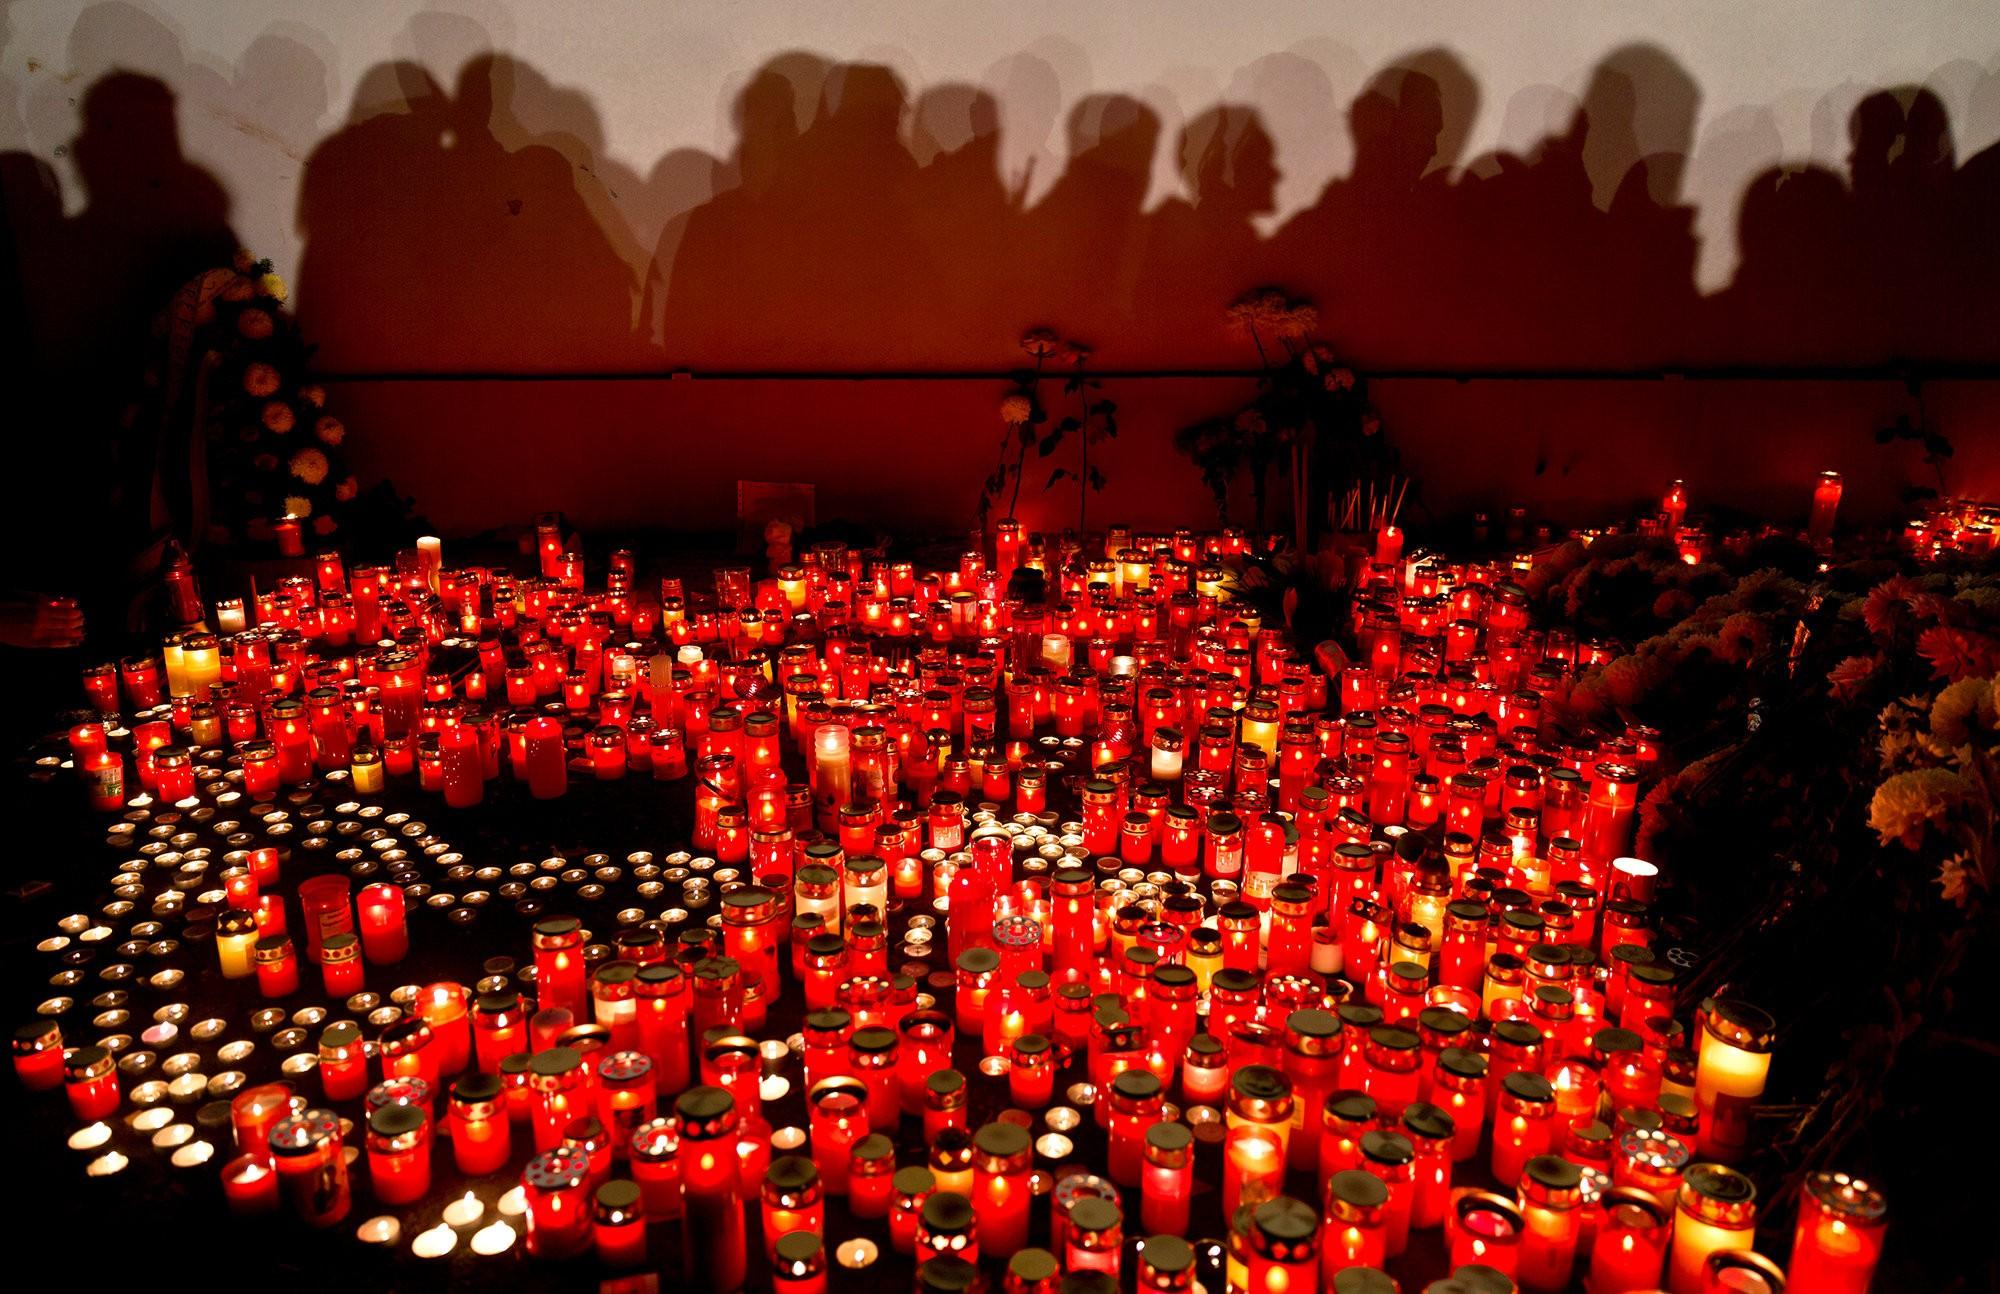 Uitgelezene A horrendous night – De Groene Amsterdammer QD-97